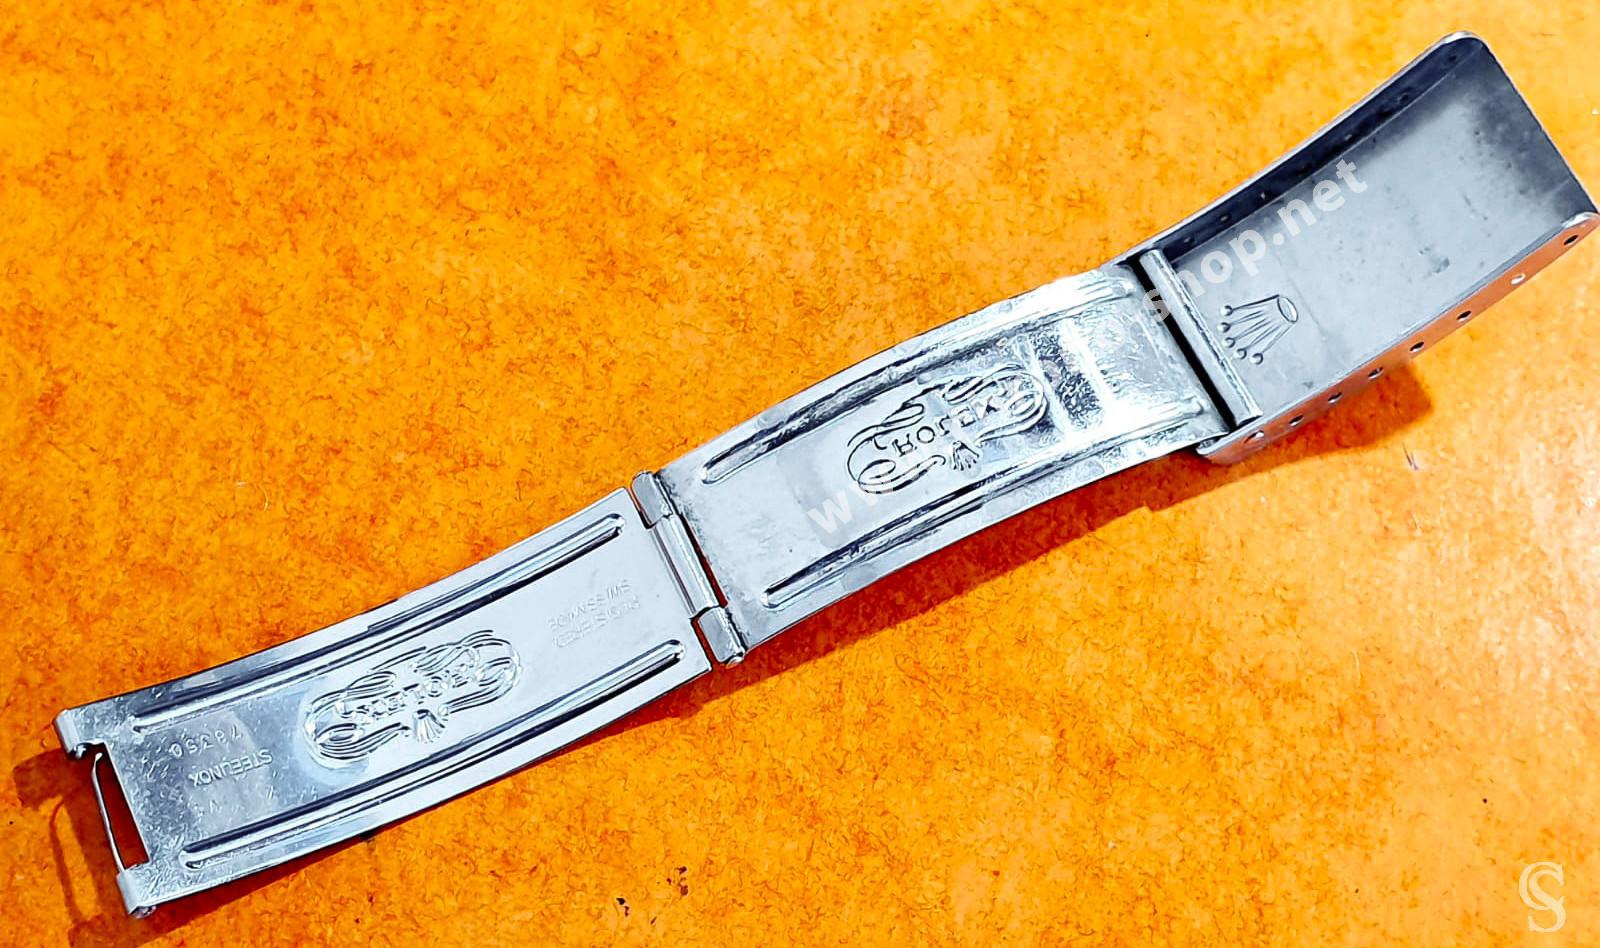 ROLEX 1996 VINTAGE FERMOIR DÉPLOYANT CODE V4 ACIER 78350 BRACELETS 19mm MONTRES OYSTER, DAYTONA 6263,6265